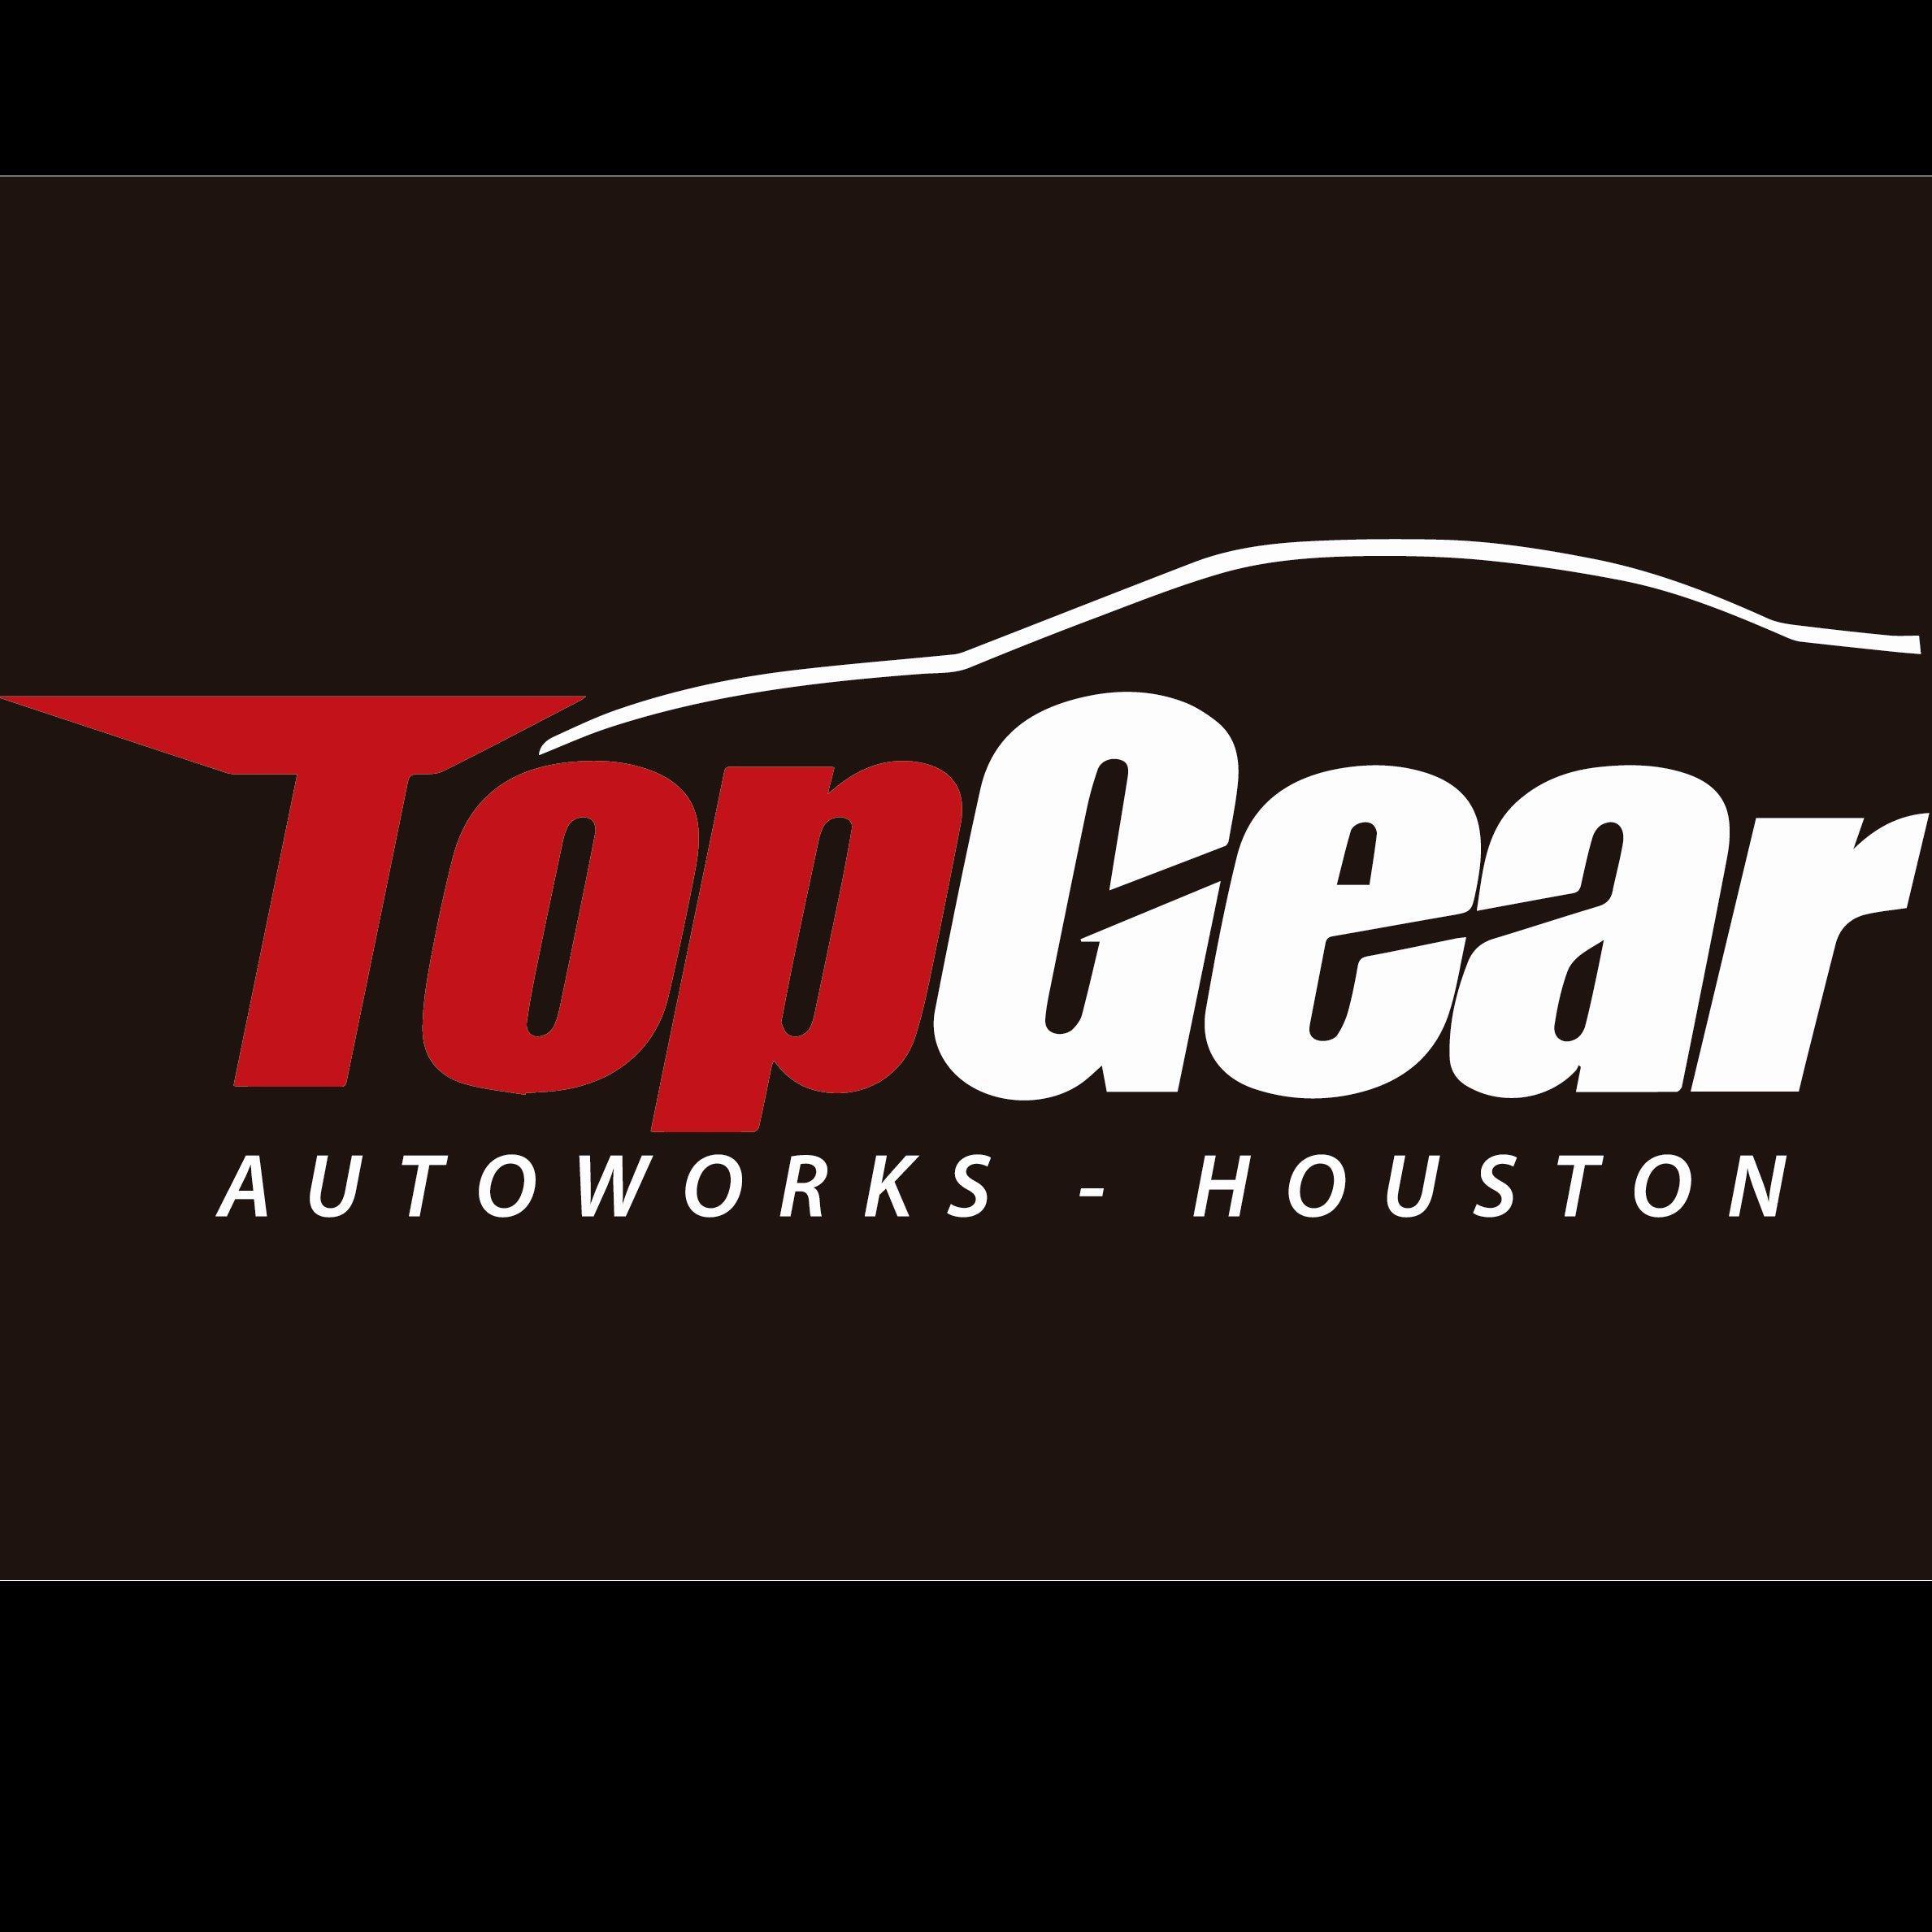 Topgear Autoworks